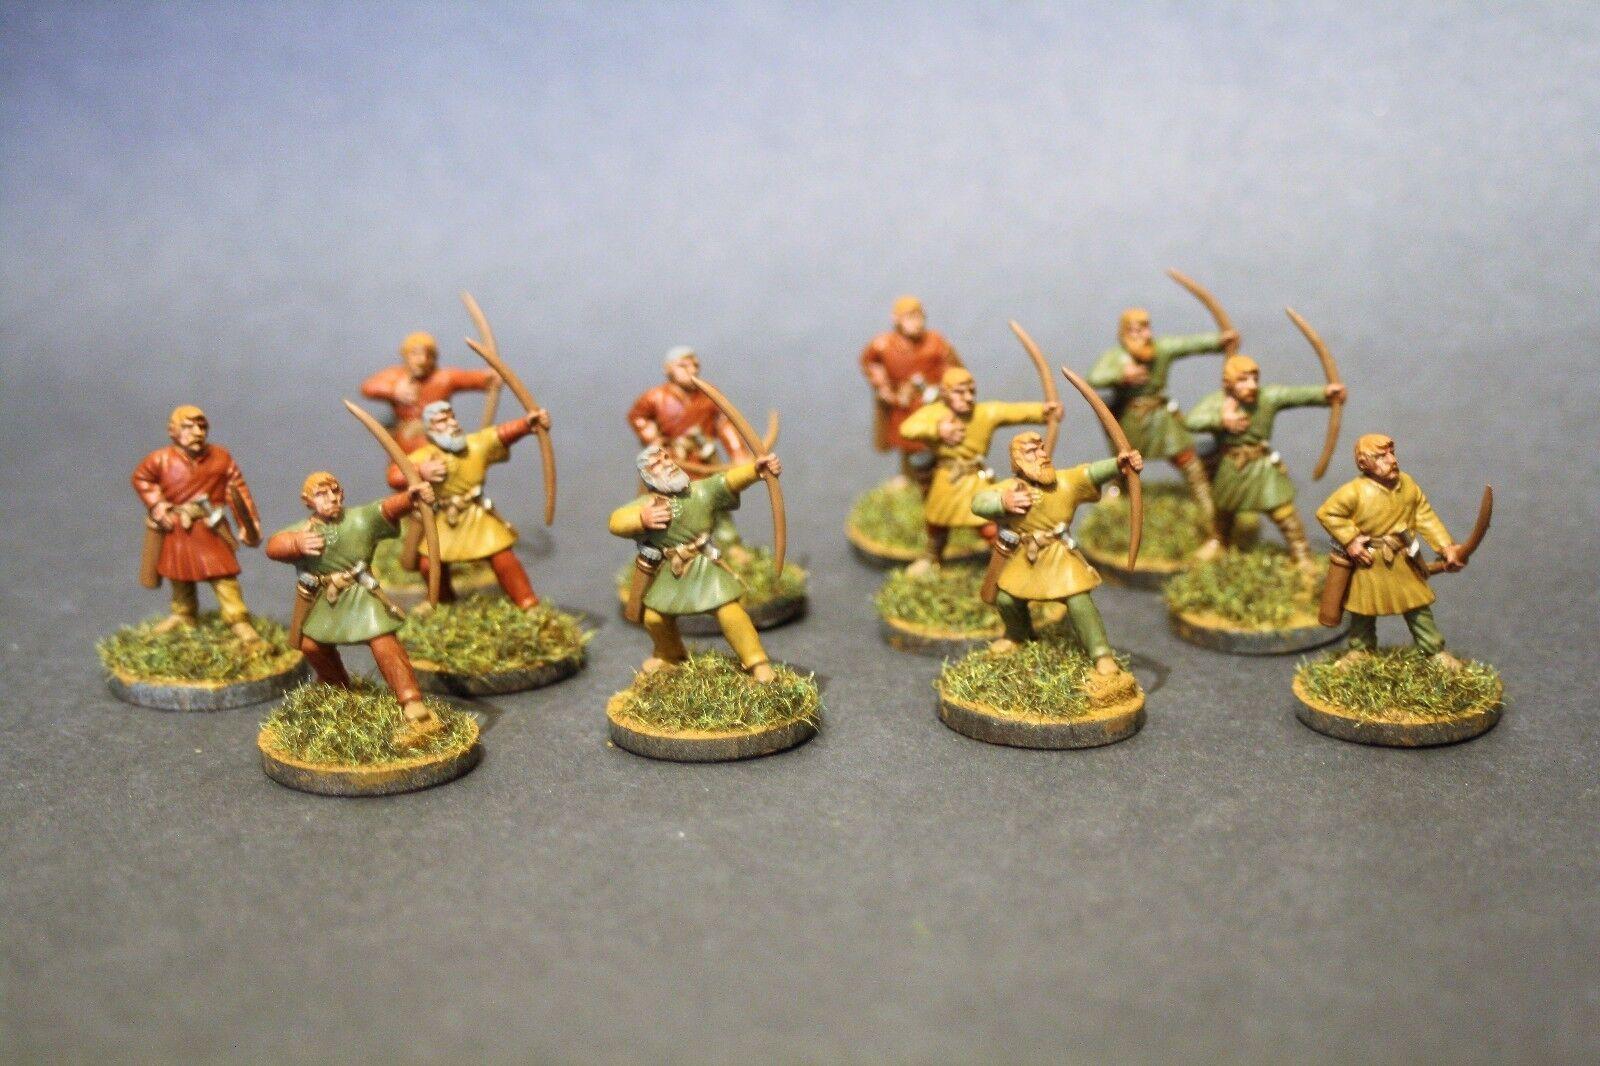 Agarre Bestia saga Swordpoint 12 X Dark Age arqueros Pintado Saxon 28 mm